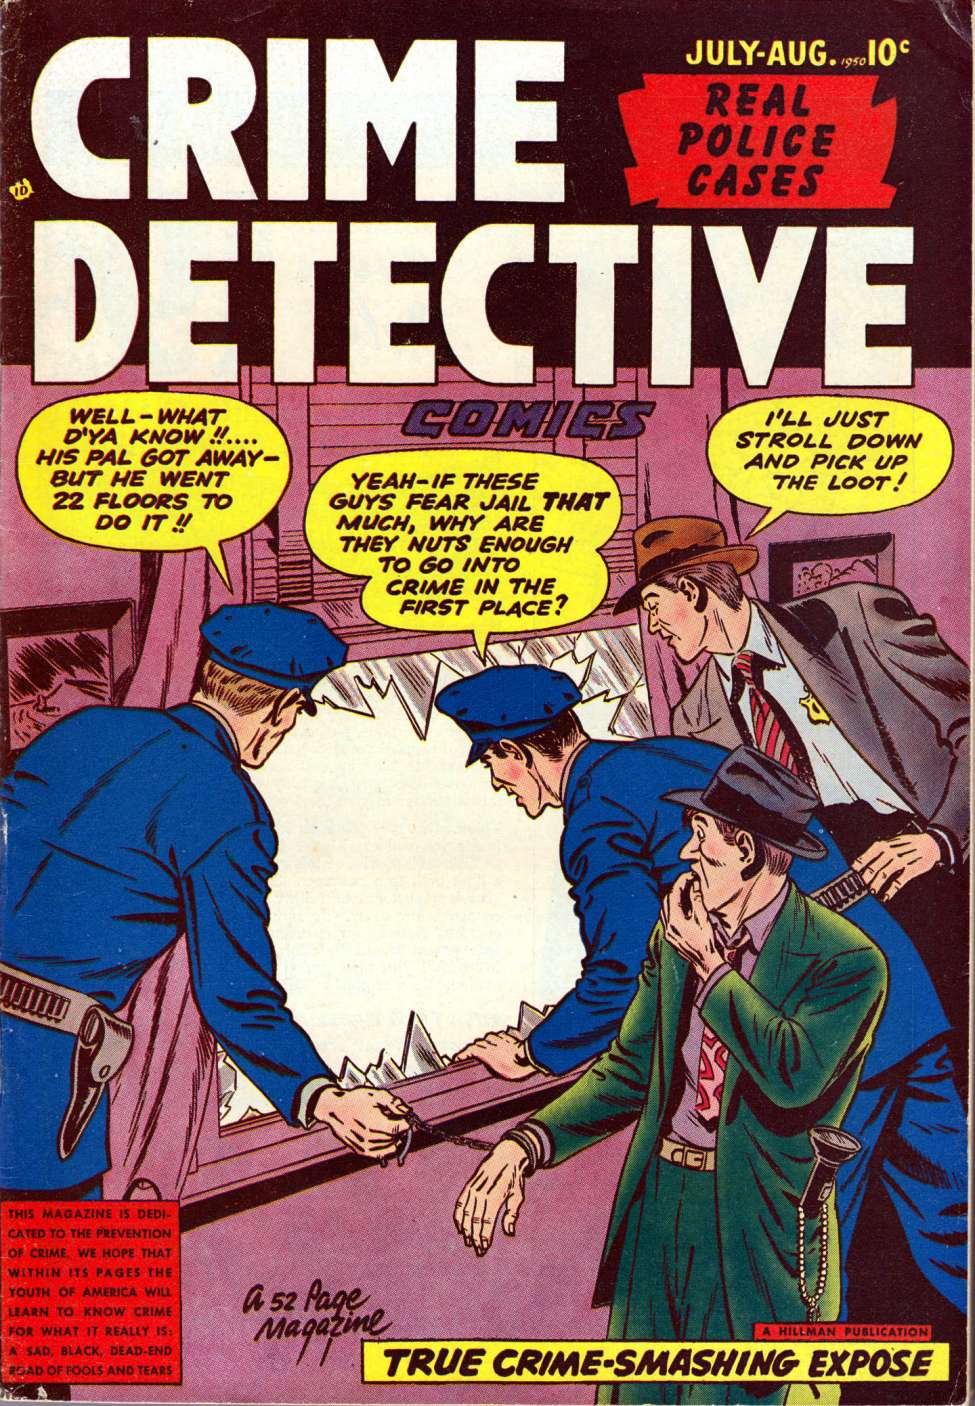 Comic Book Cover For Crime Detective Comics v2 #3